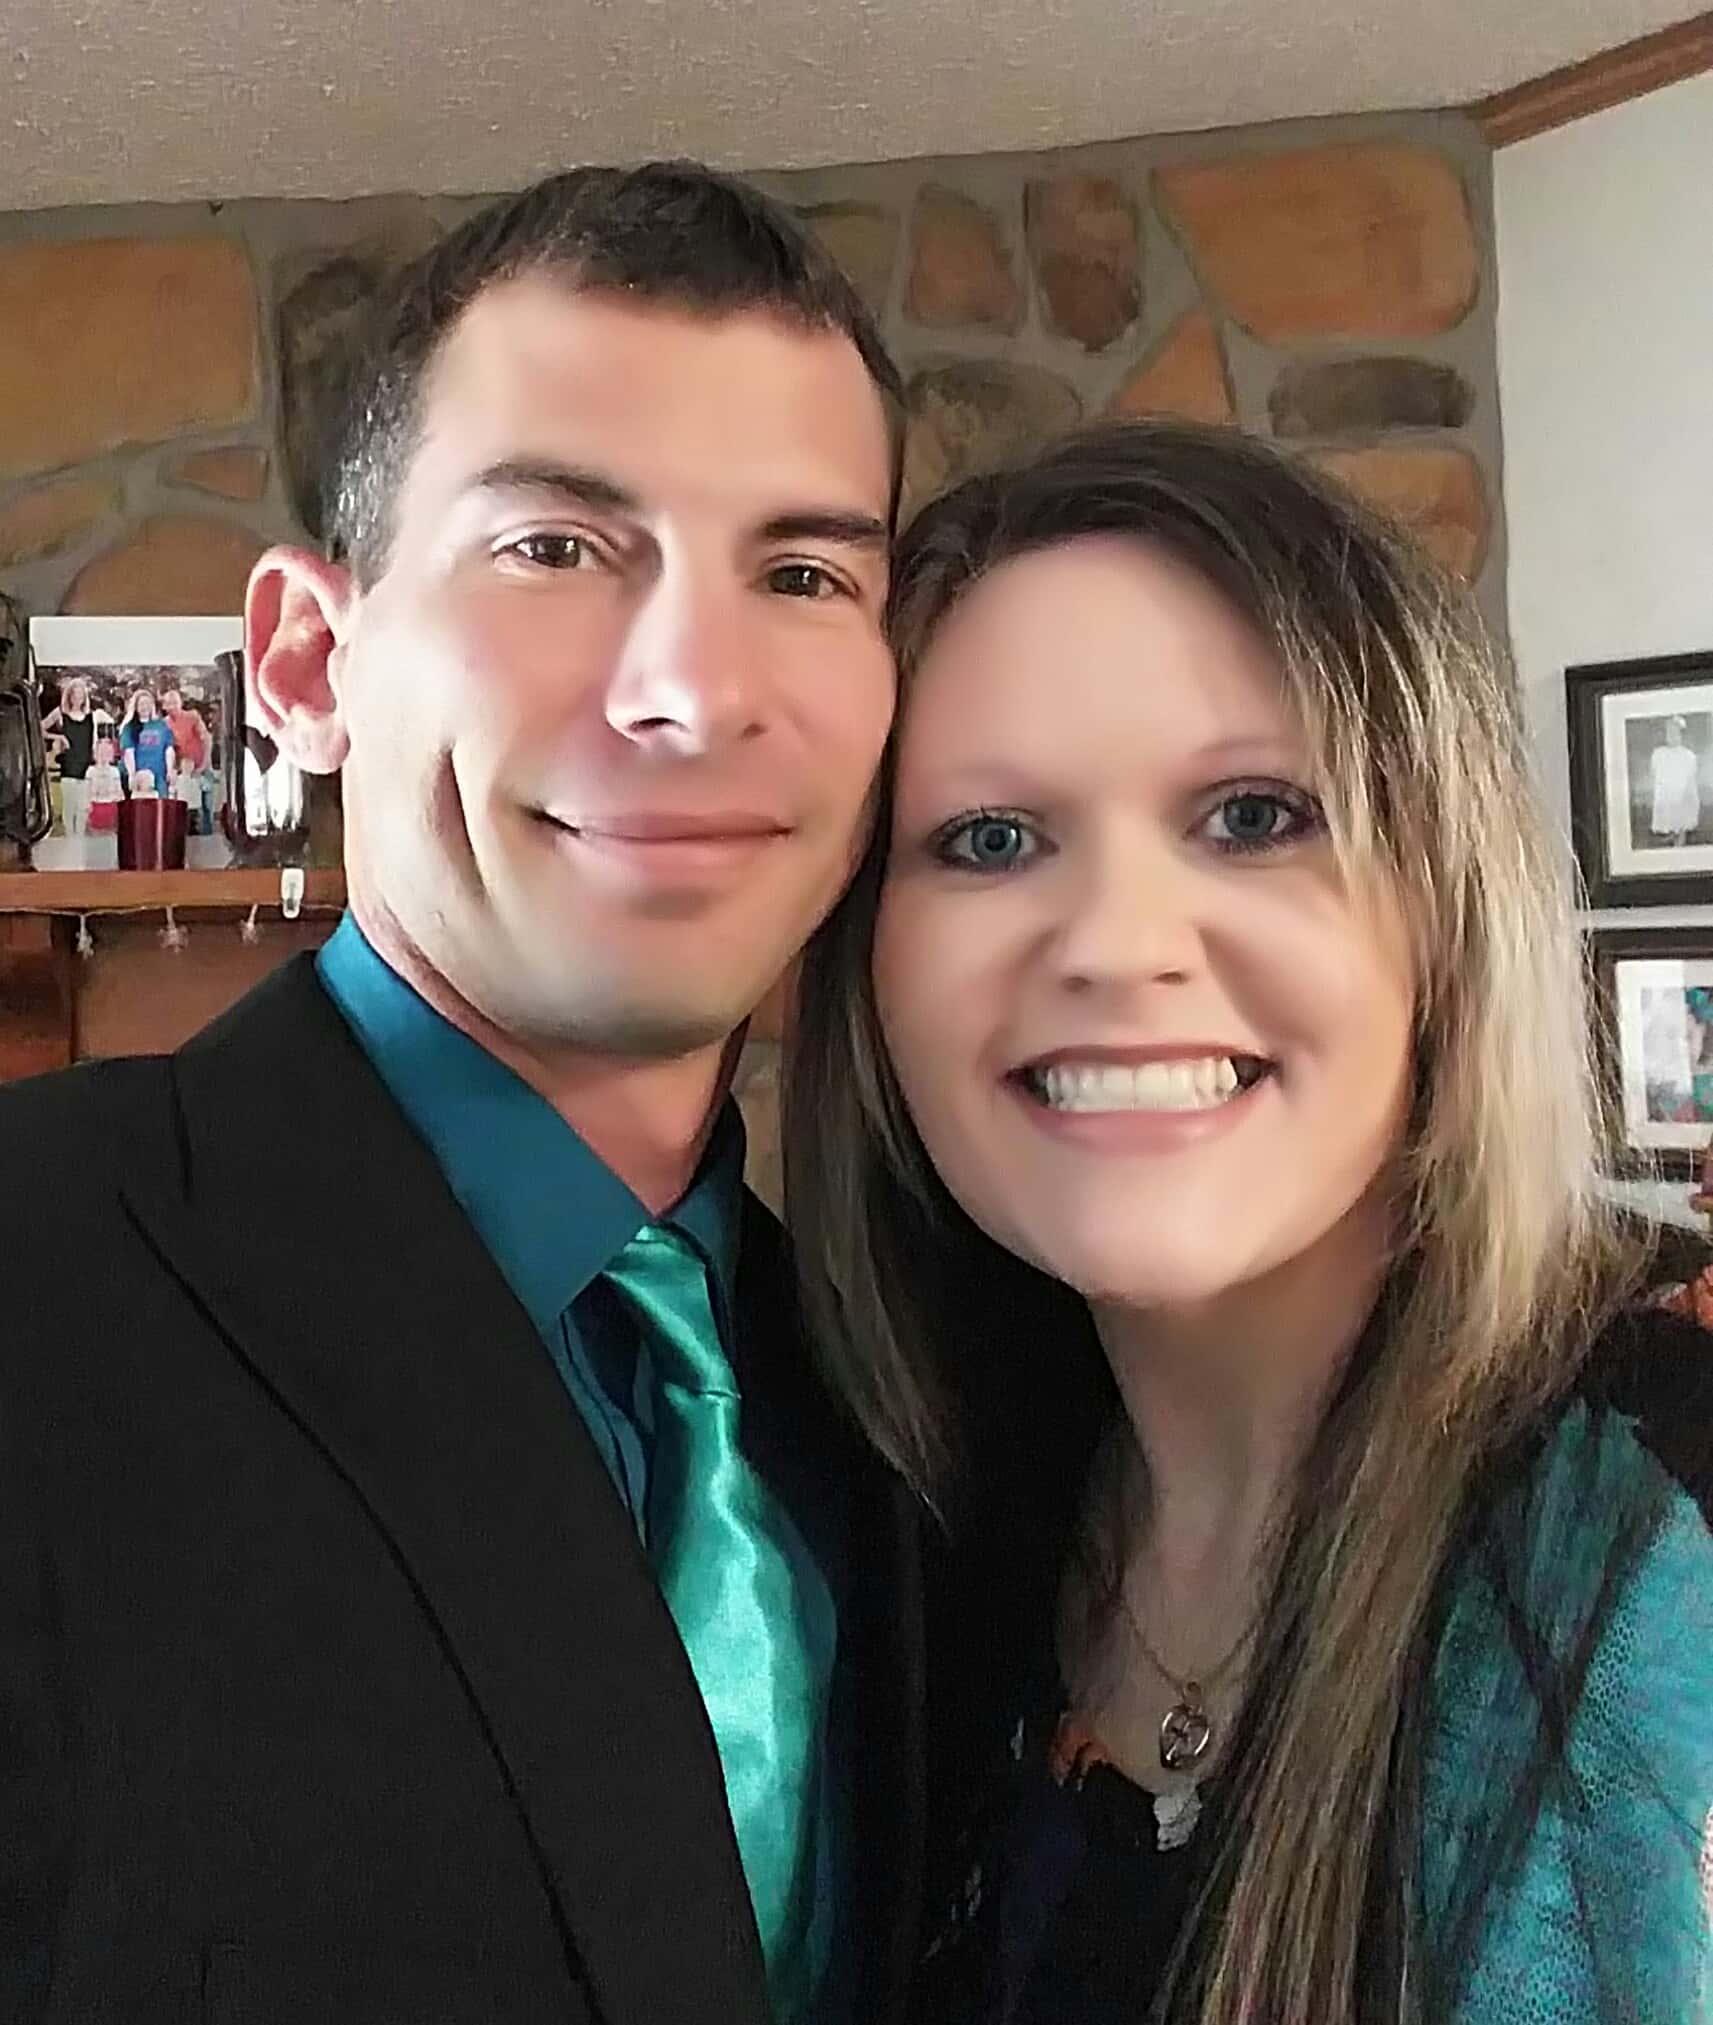 Stephen-Jeronymo-and-Amanda-Hicks